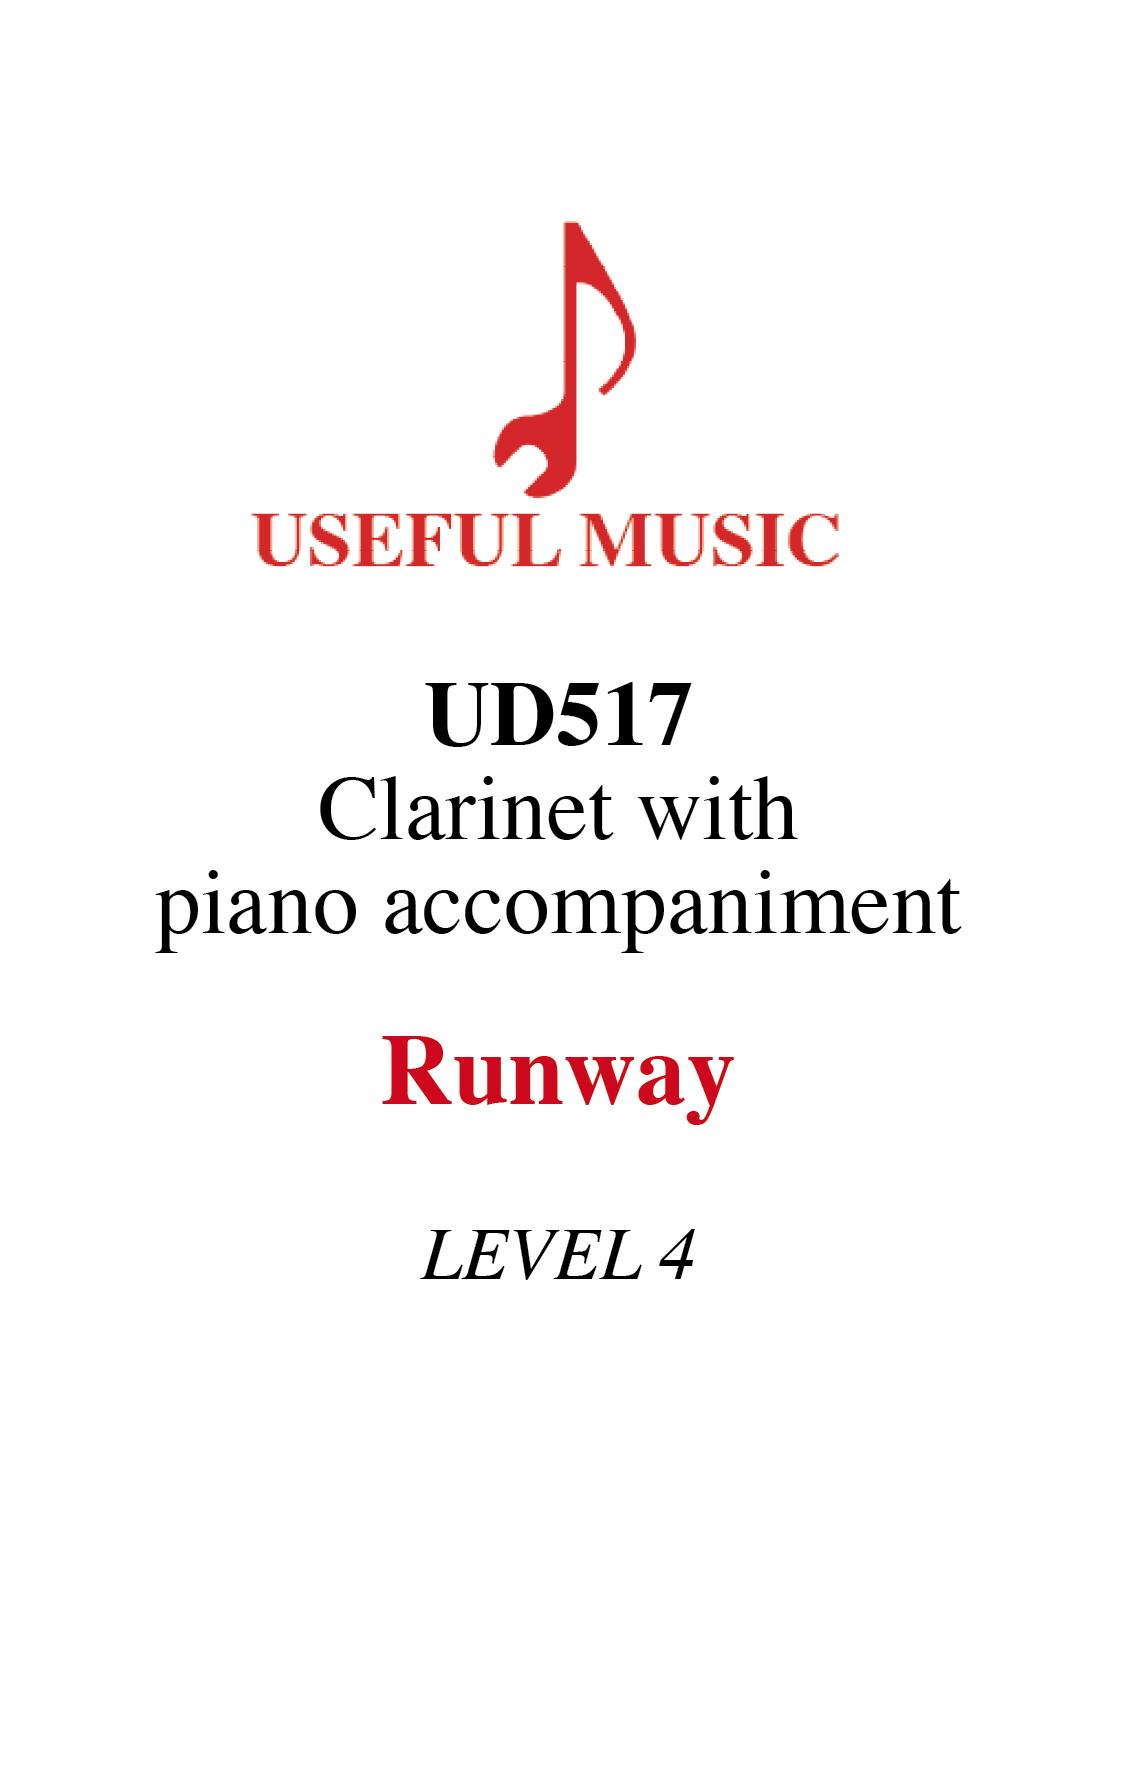 Runway - Clarinet with piano accompaniment